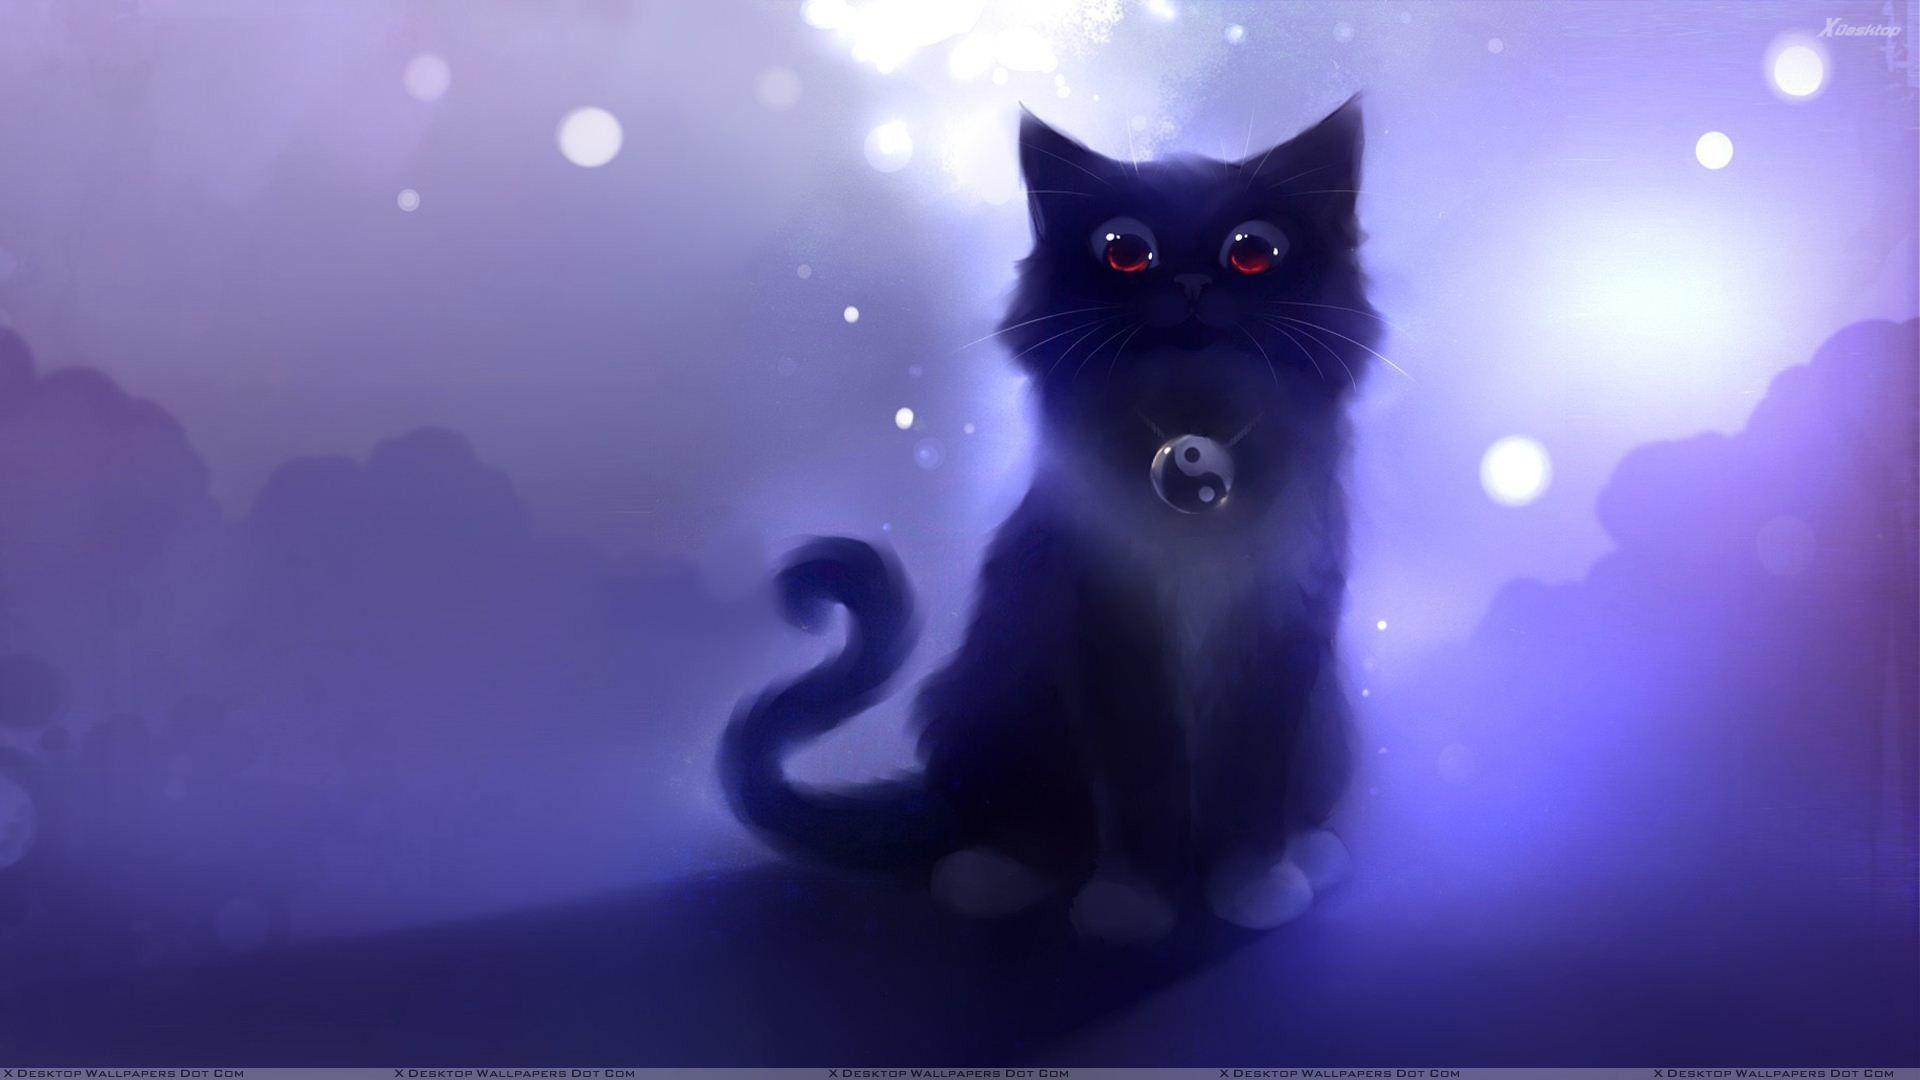 1920x1080 Cartoon Black Cat Sitting Wallpaper Cute Anime Cat